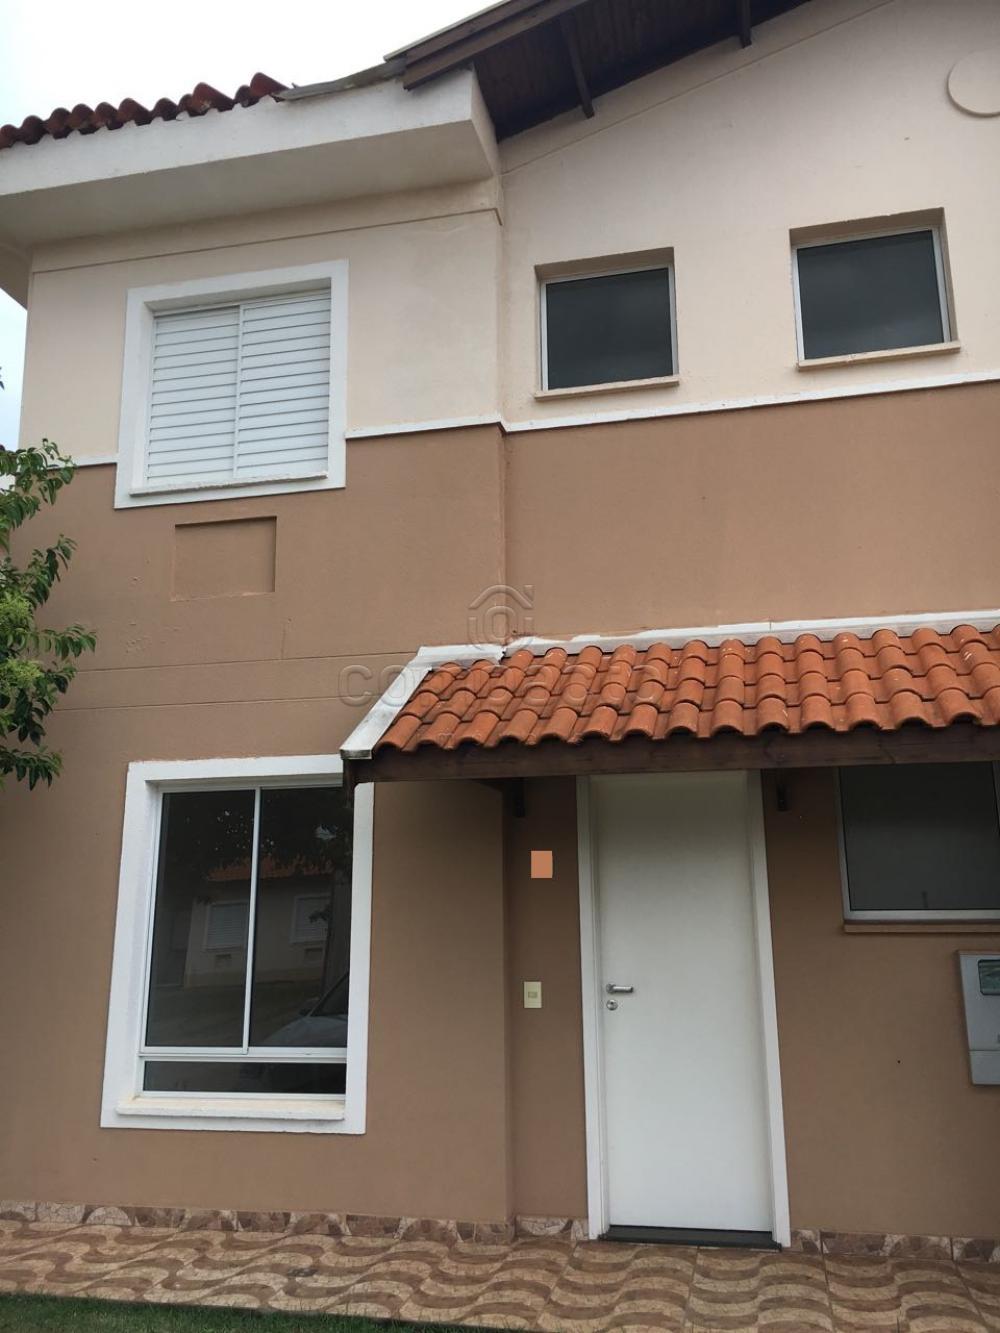 Sao Jose do Rio Preto Casa Venda R$375.000,00 Condominio R$362,00 3 Dormitorios 1 Suite Area construida 125.00m2